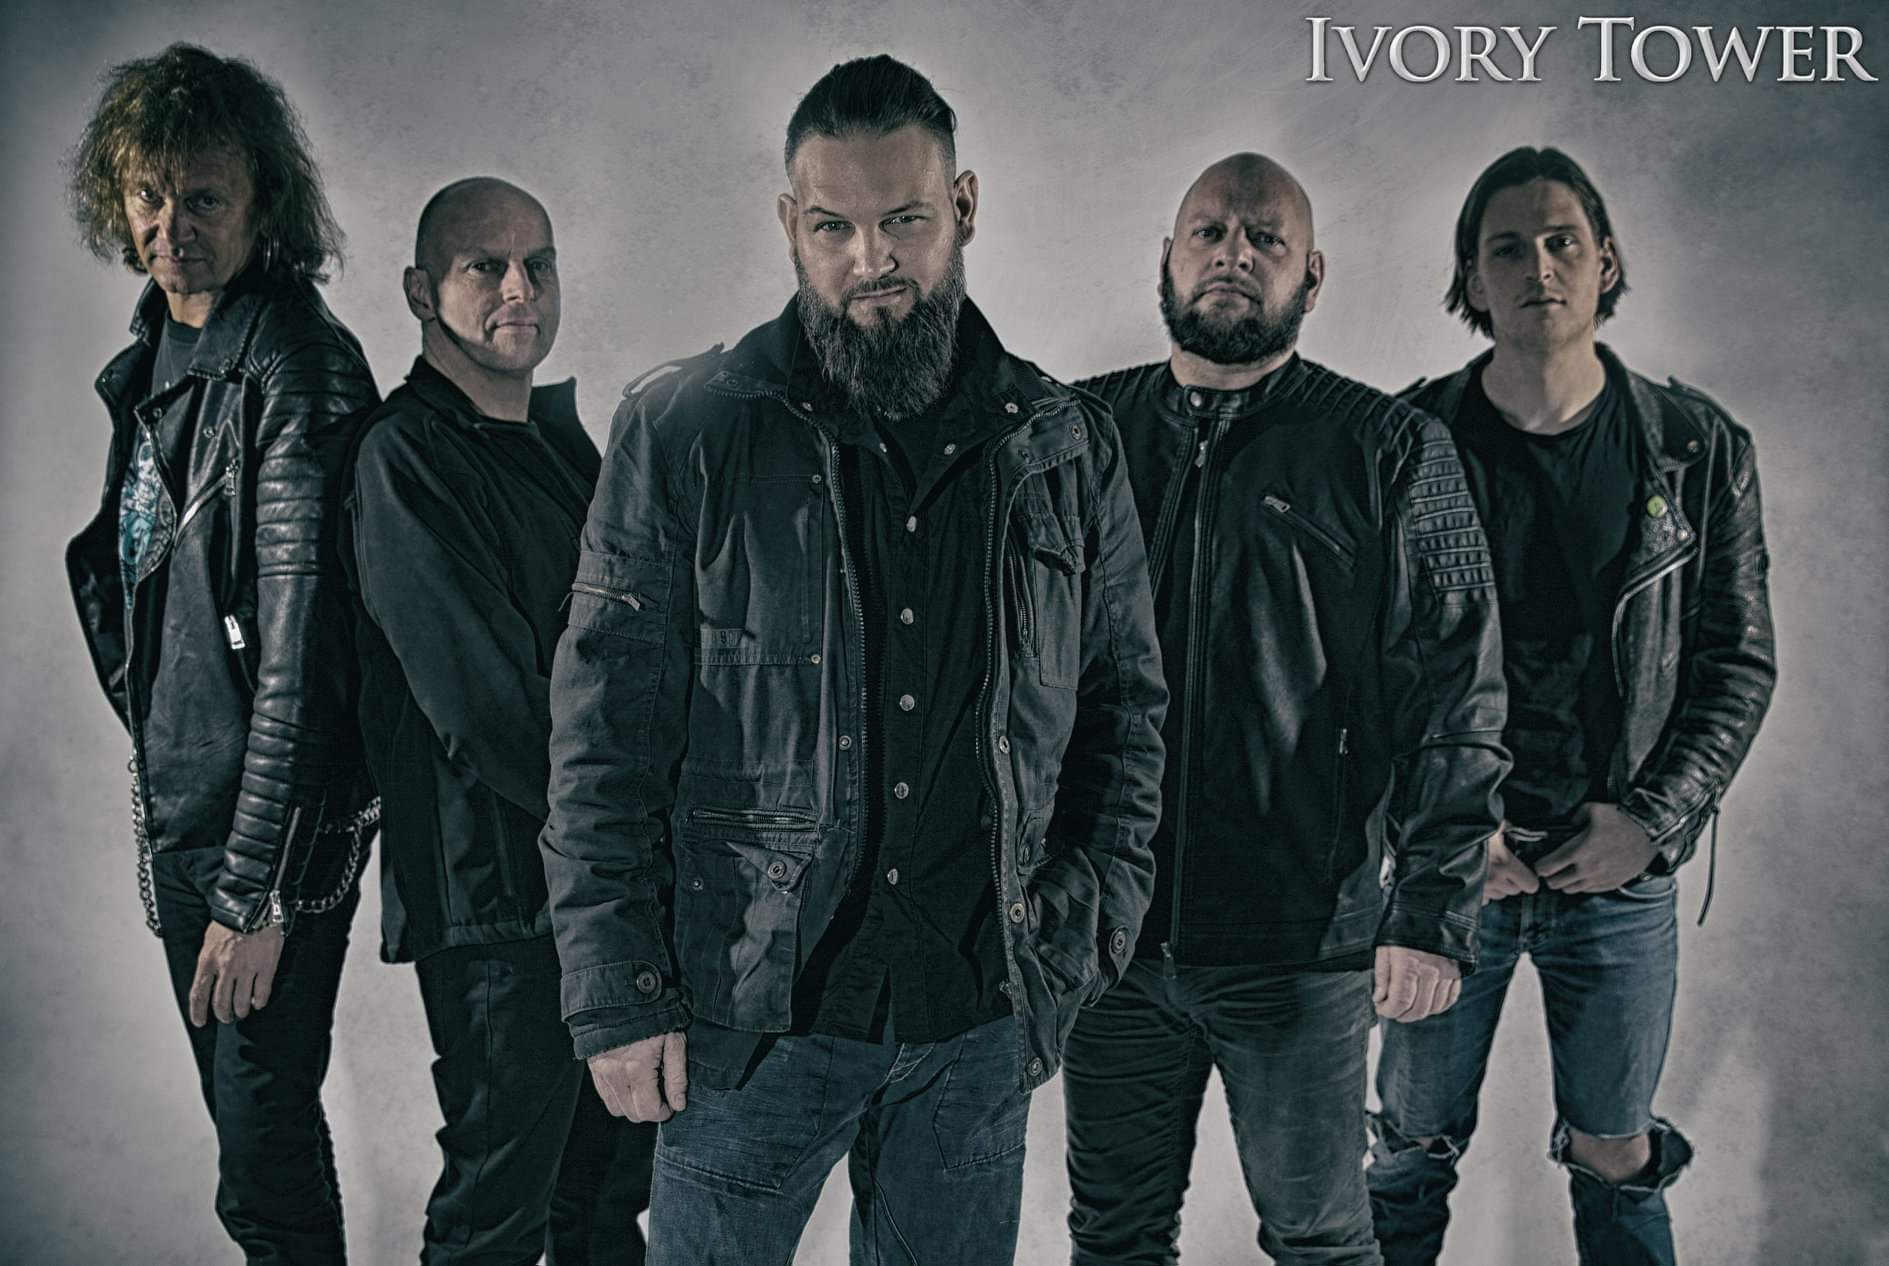 Ivory Tower - Photo